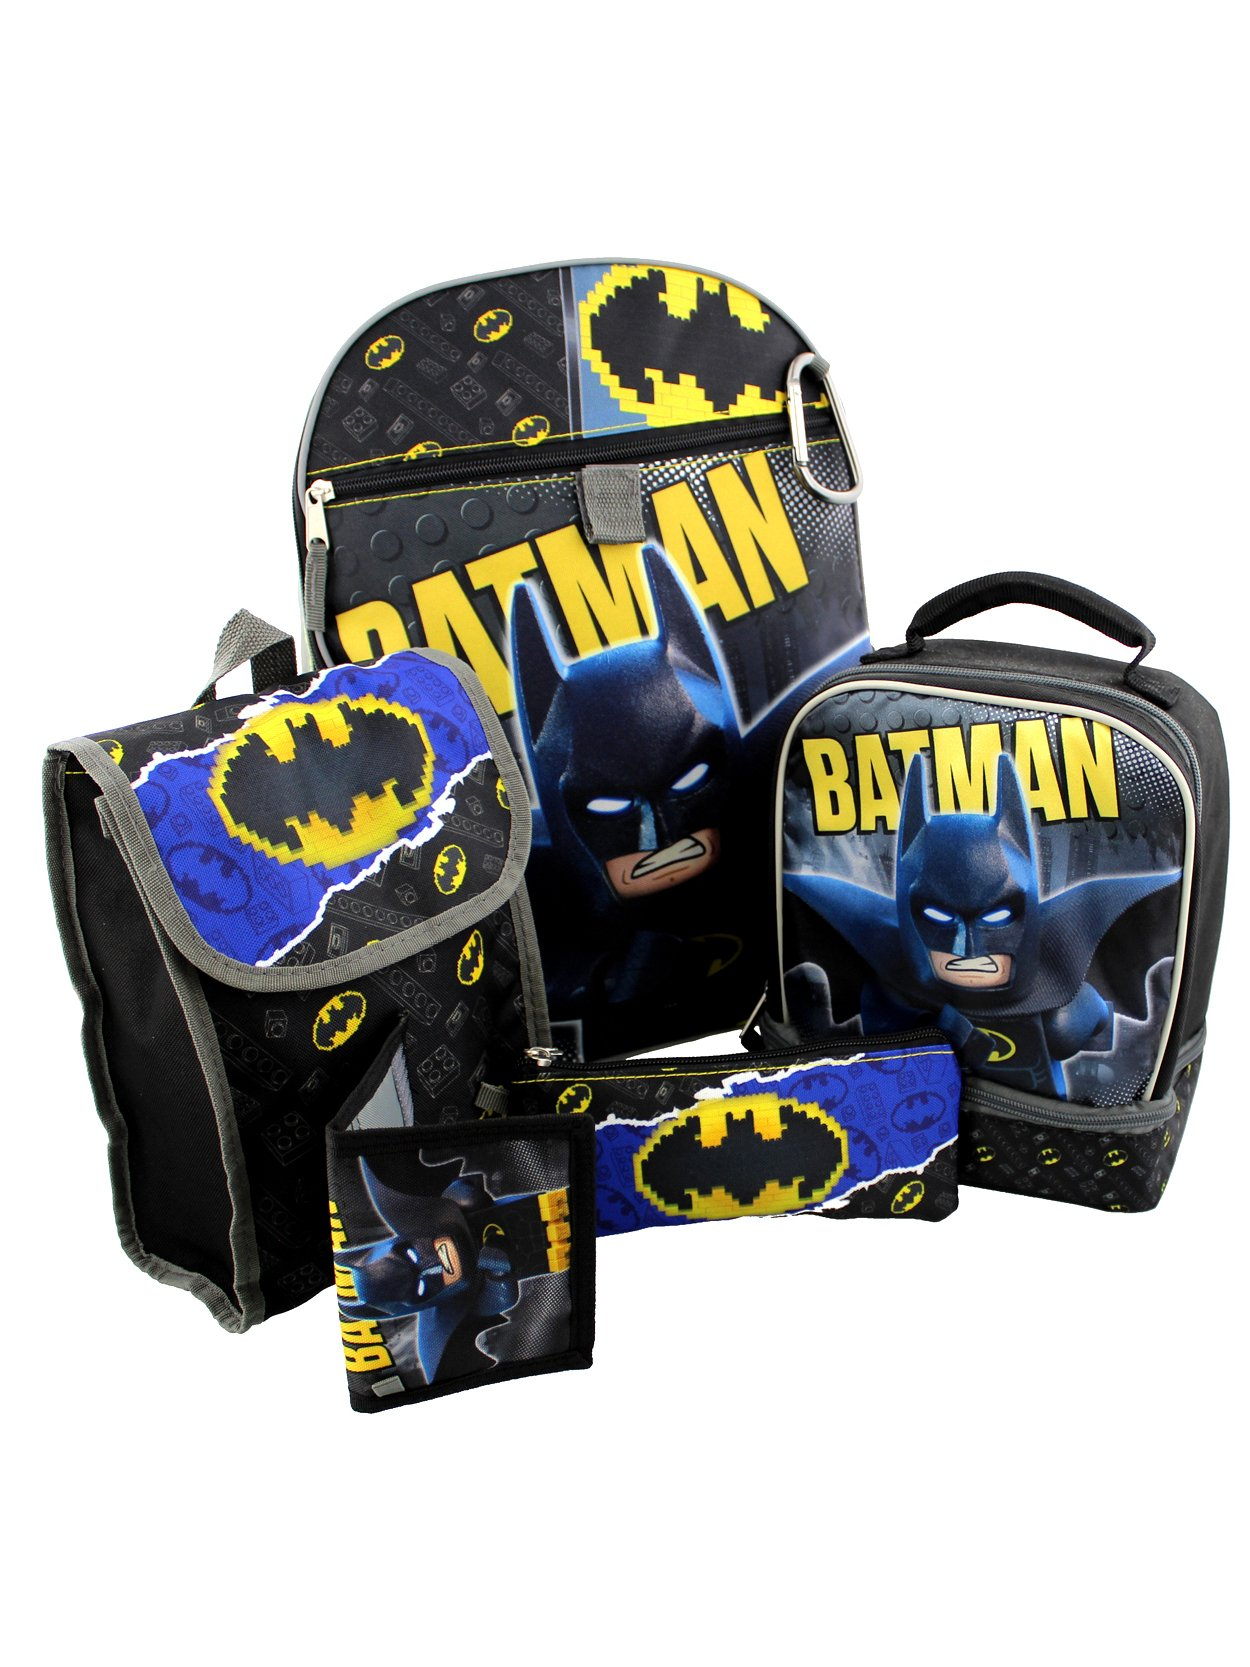 Lego Batman 6 piece Backpack and Lunch Box School Set (Black/Grey, One Size)